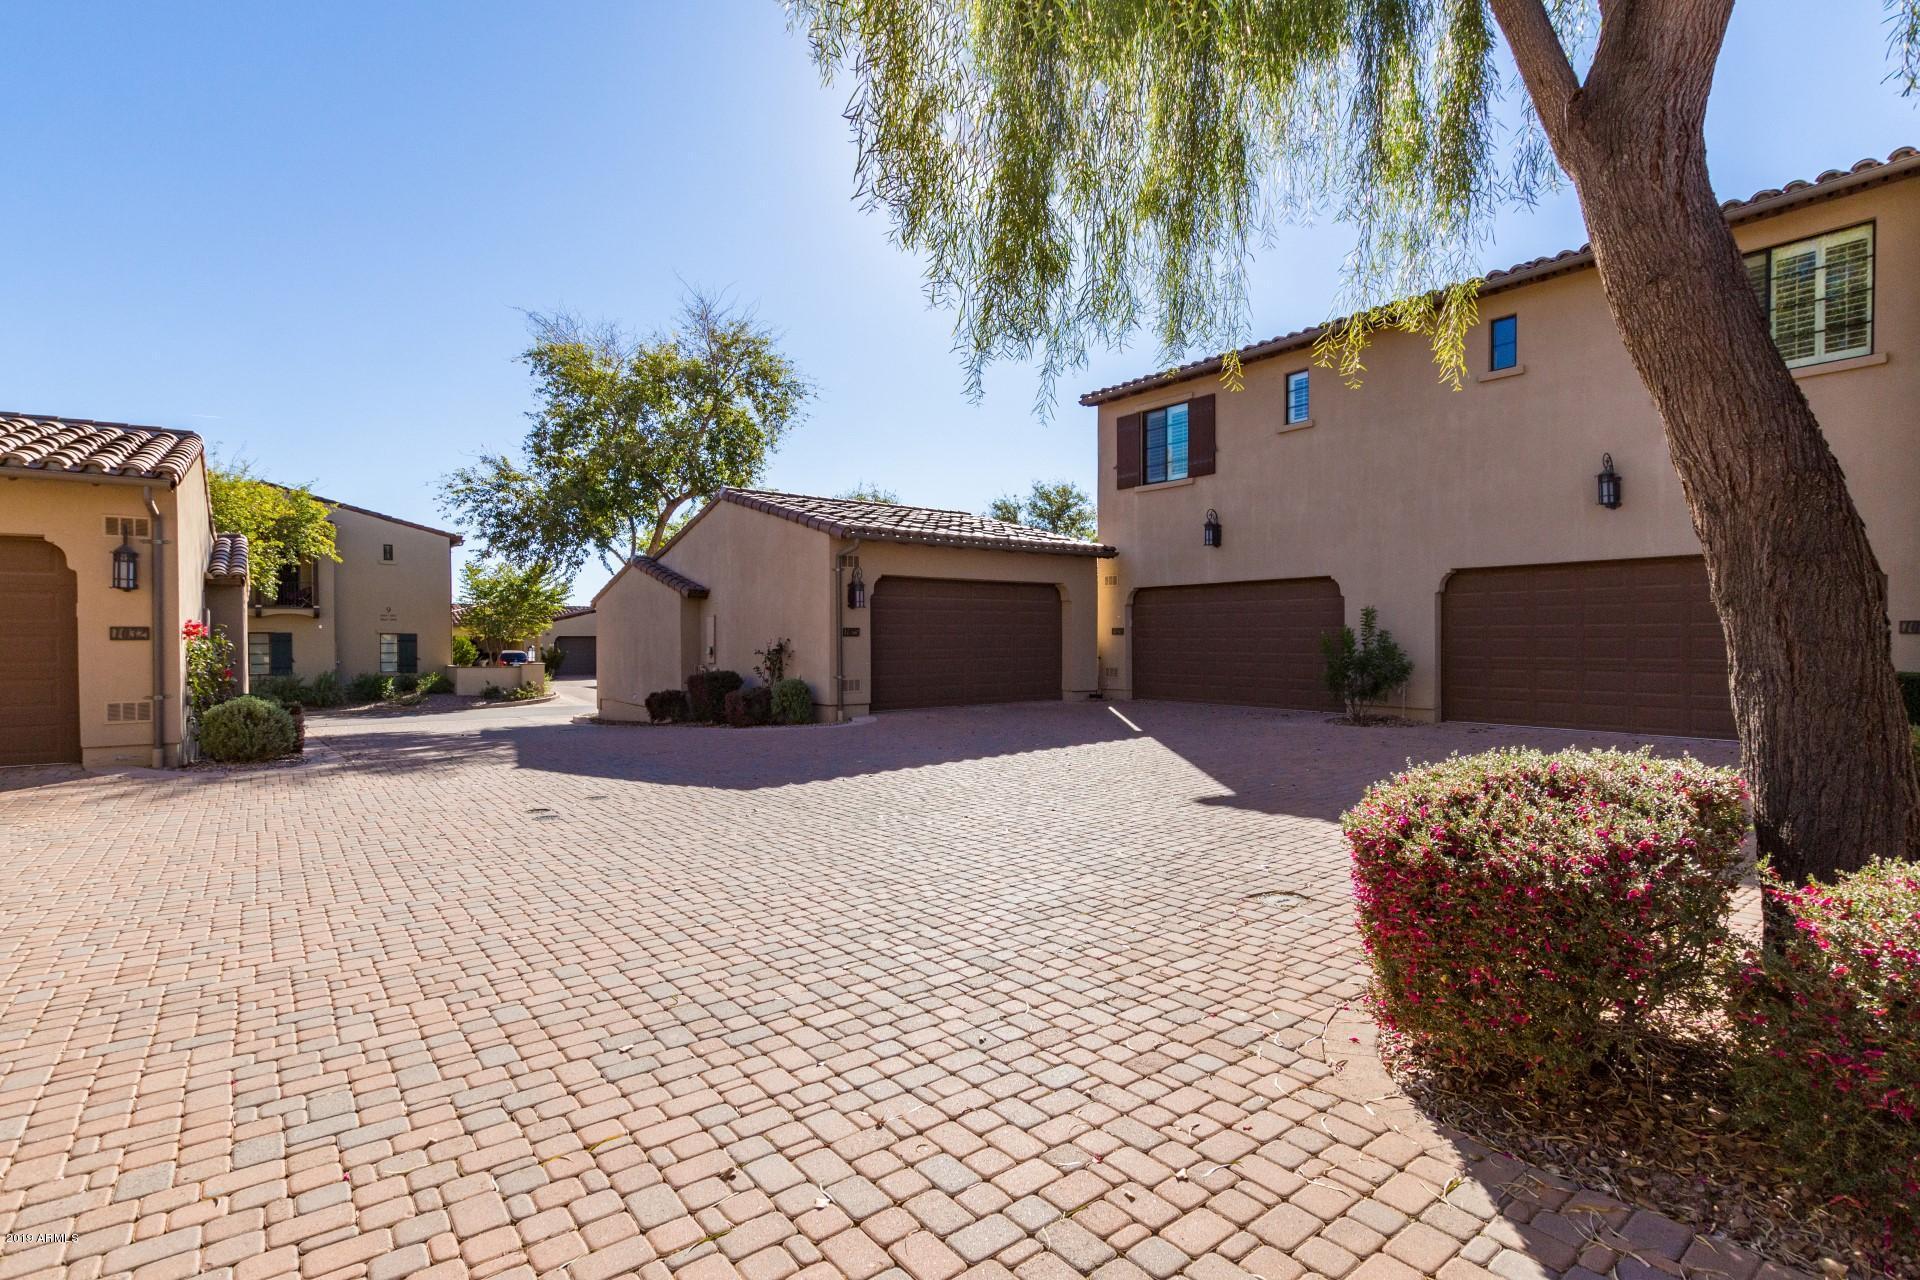 MLS 5856380 18650 N THOMPSON PEAK Parkway Unit 2026, Scottsdale, AZ 85255 Scottsdale AZ Dc Ranch